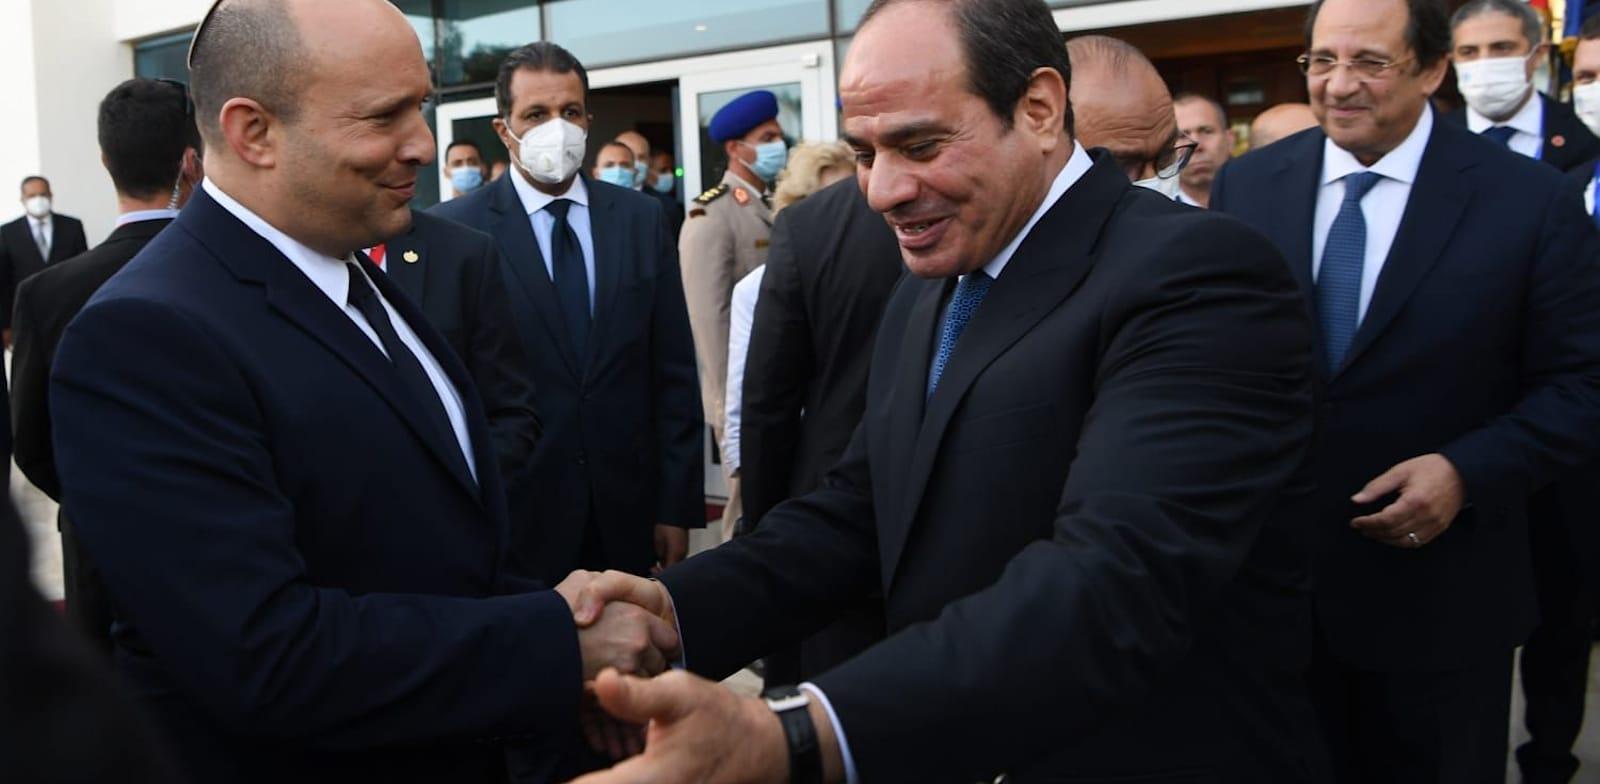 Prime Minister Naftali Bennett and Presdient Abdel Fatah Al-Sisi meet in Sharm El-Sheikh  credit: GPO, Kobi Gideon